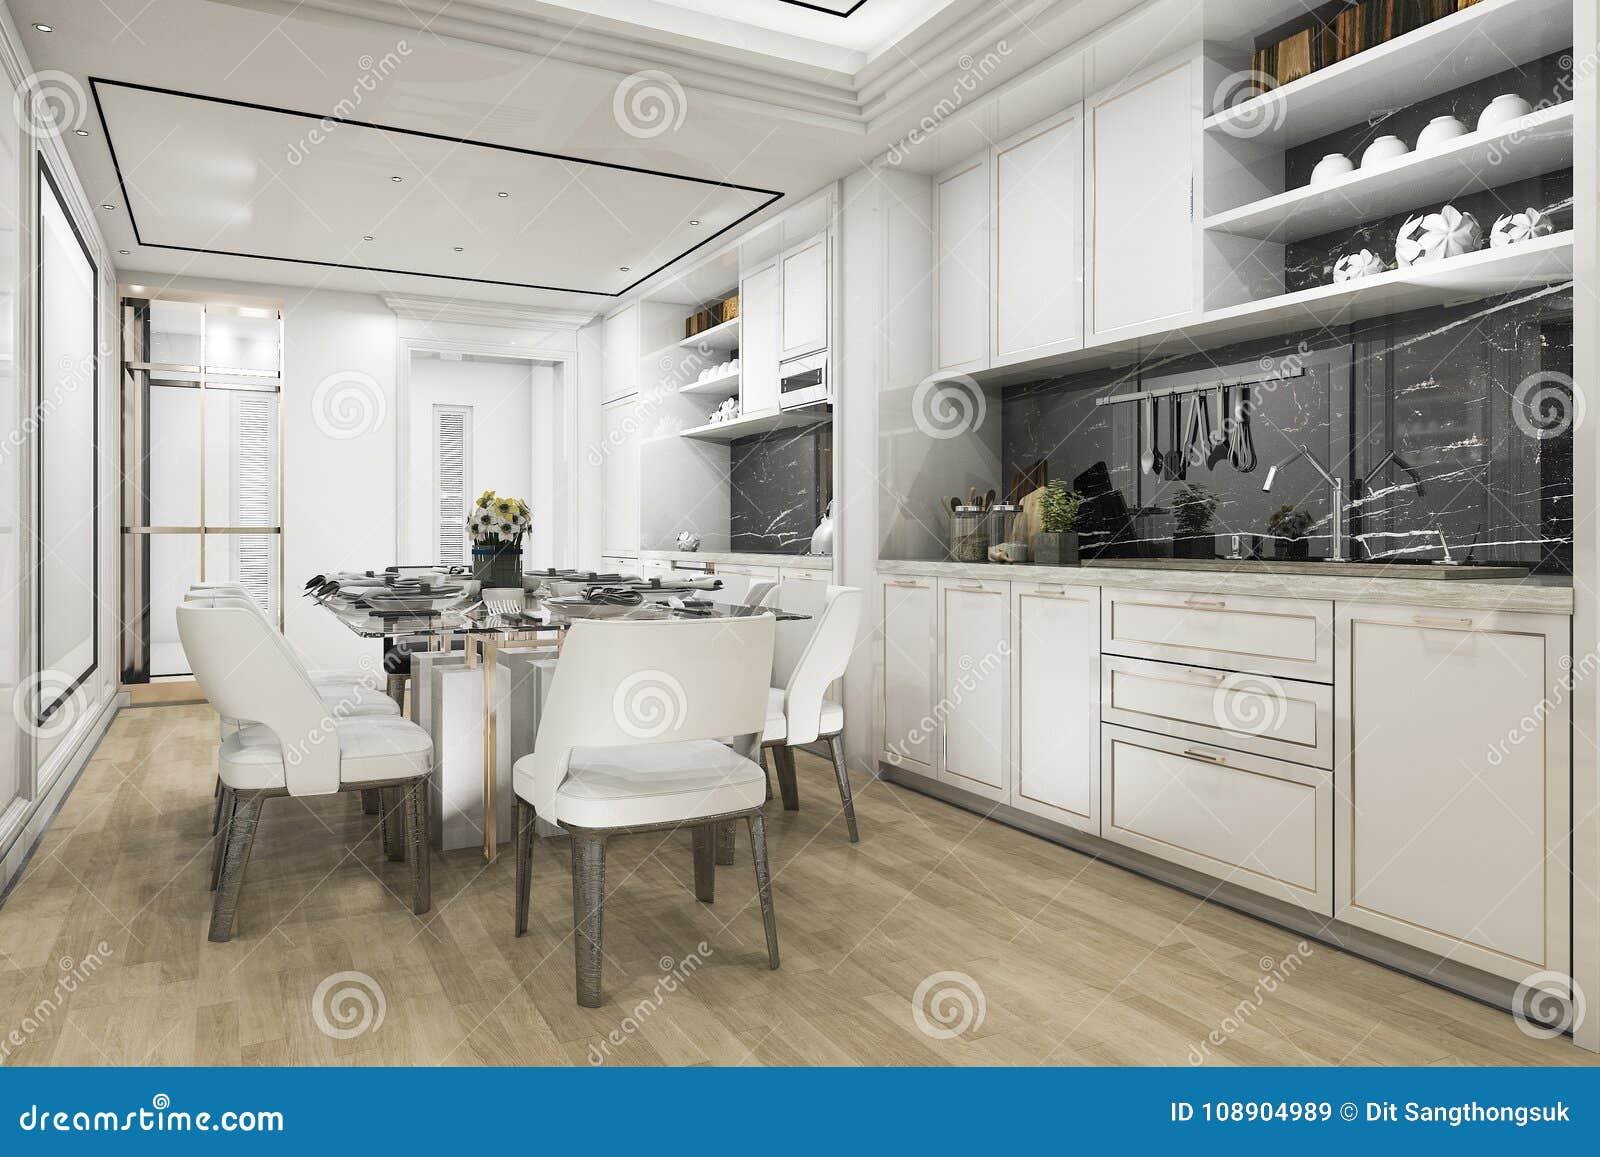 Mooie Witte Keuken : Mooie witte keuken stockfoto s freeimages